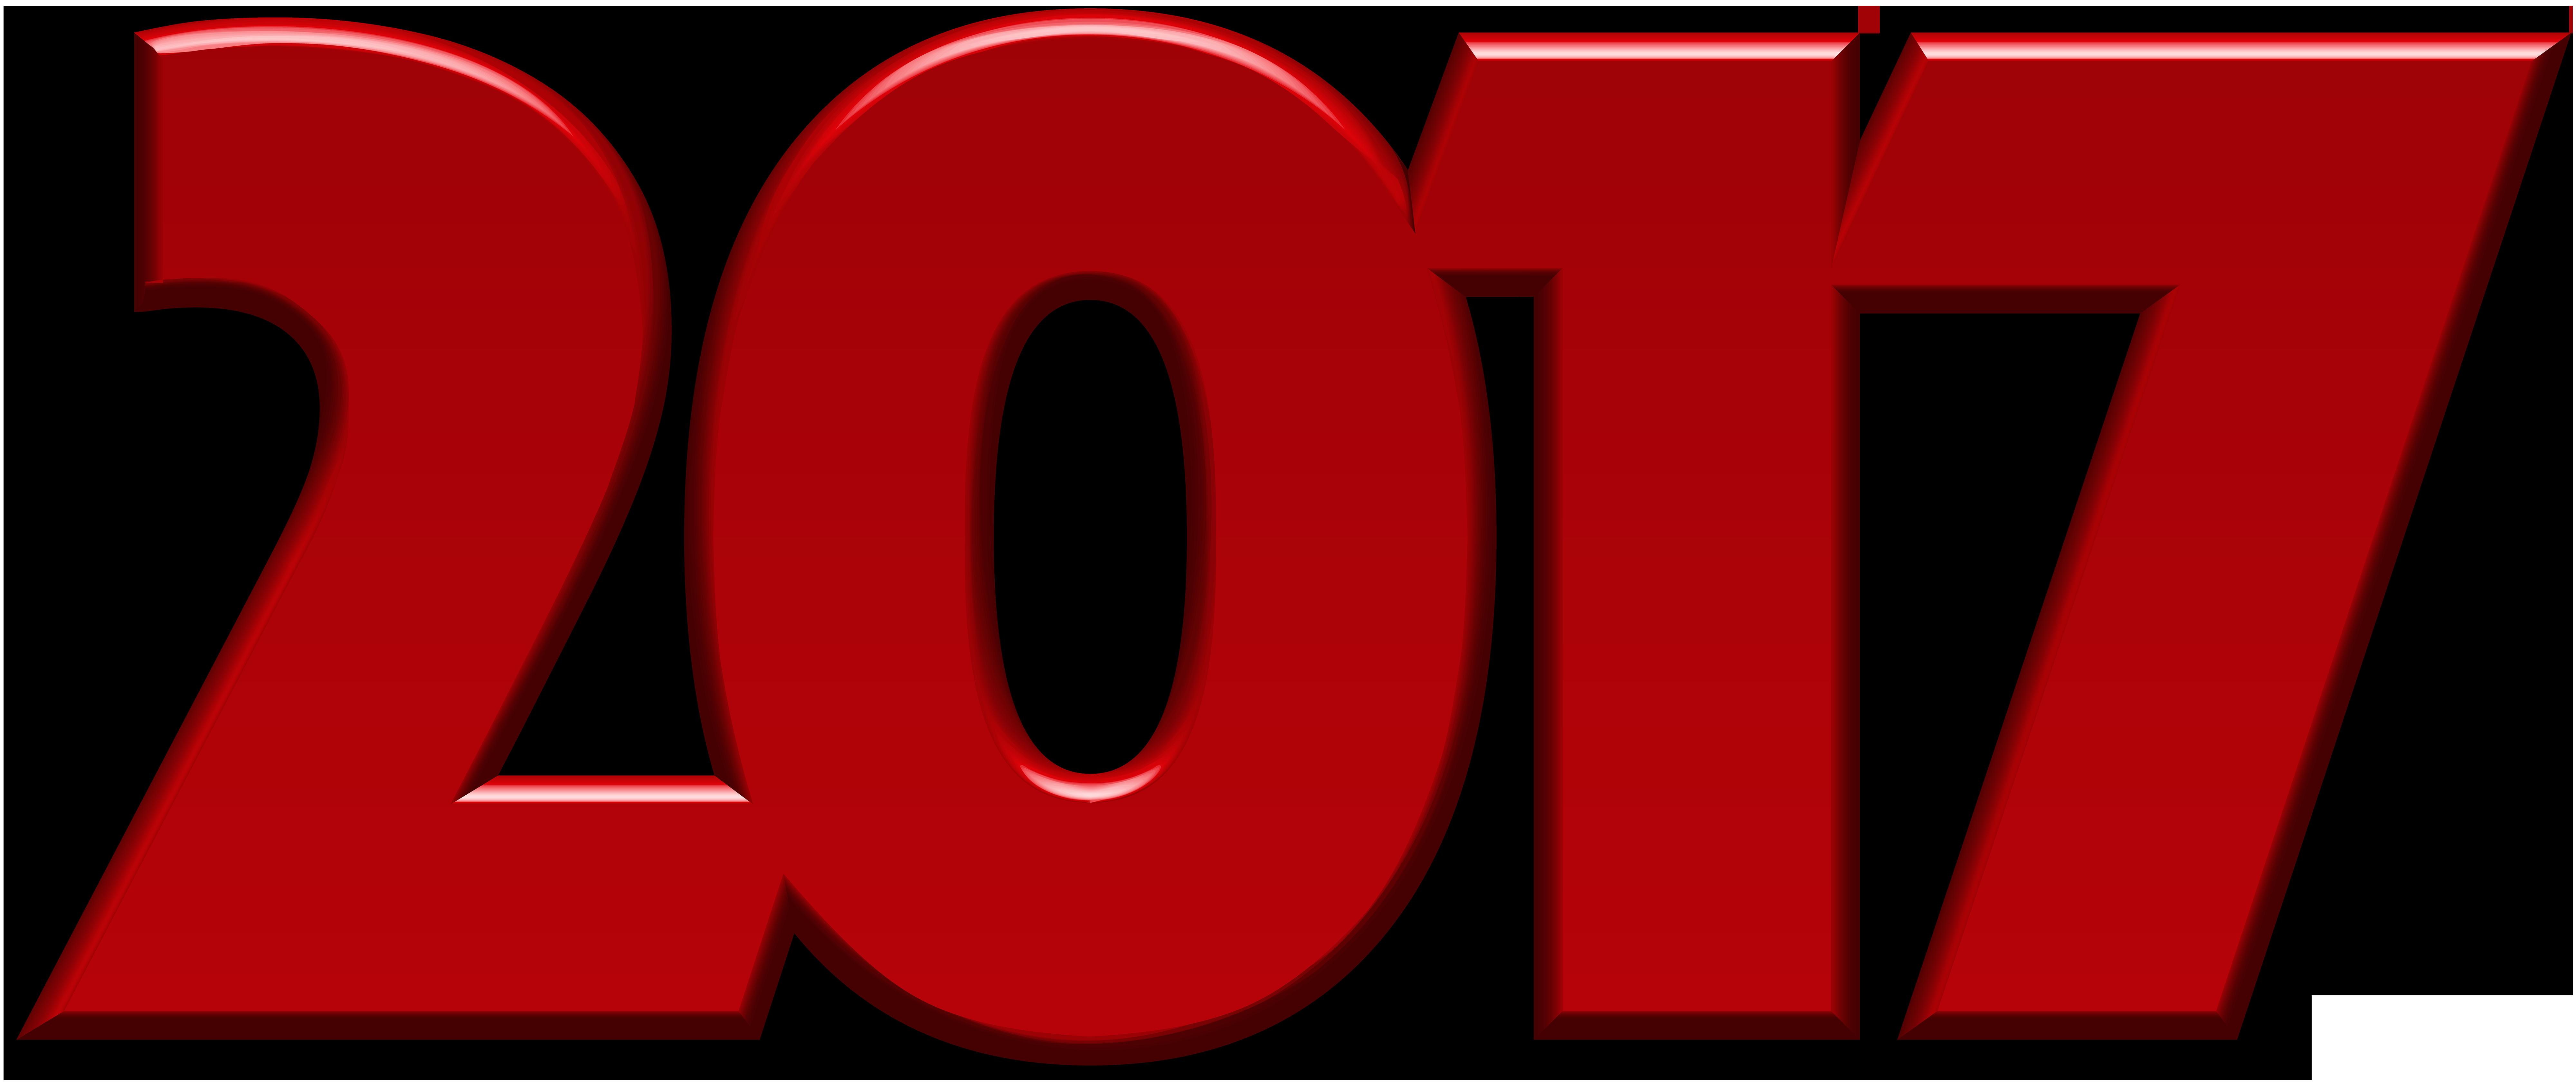 Free 2017 Clip Art, Download Free Clip Art, Free Clip Art on.